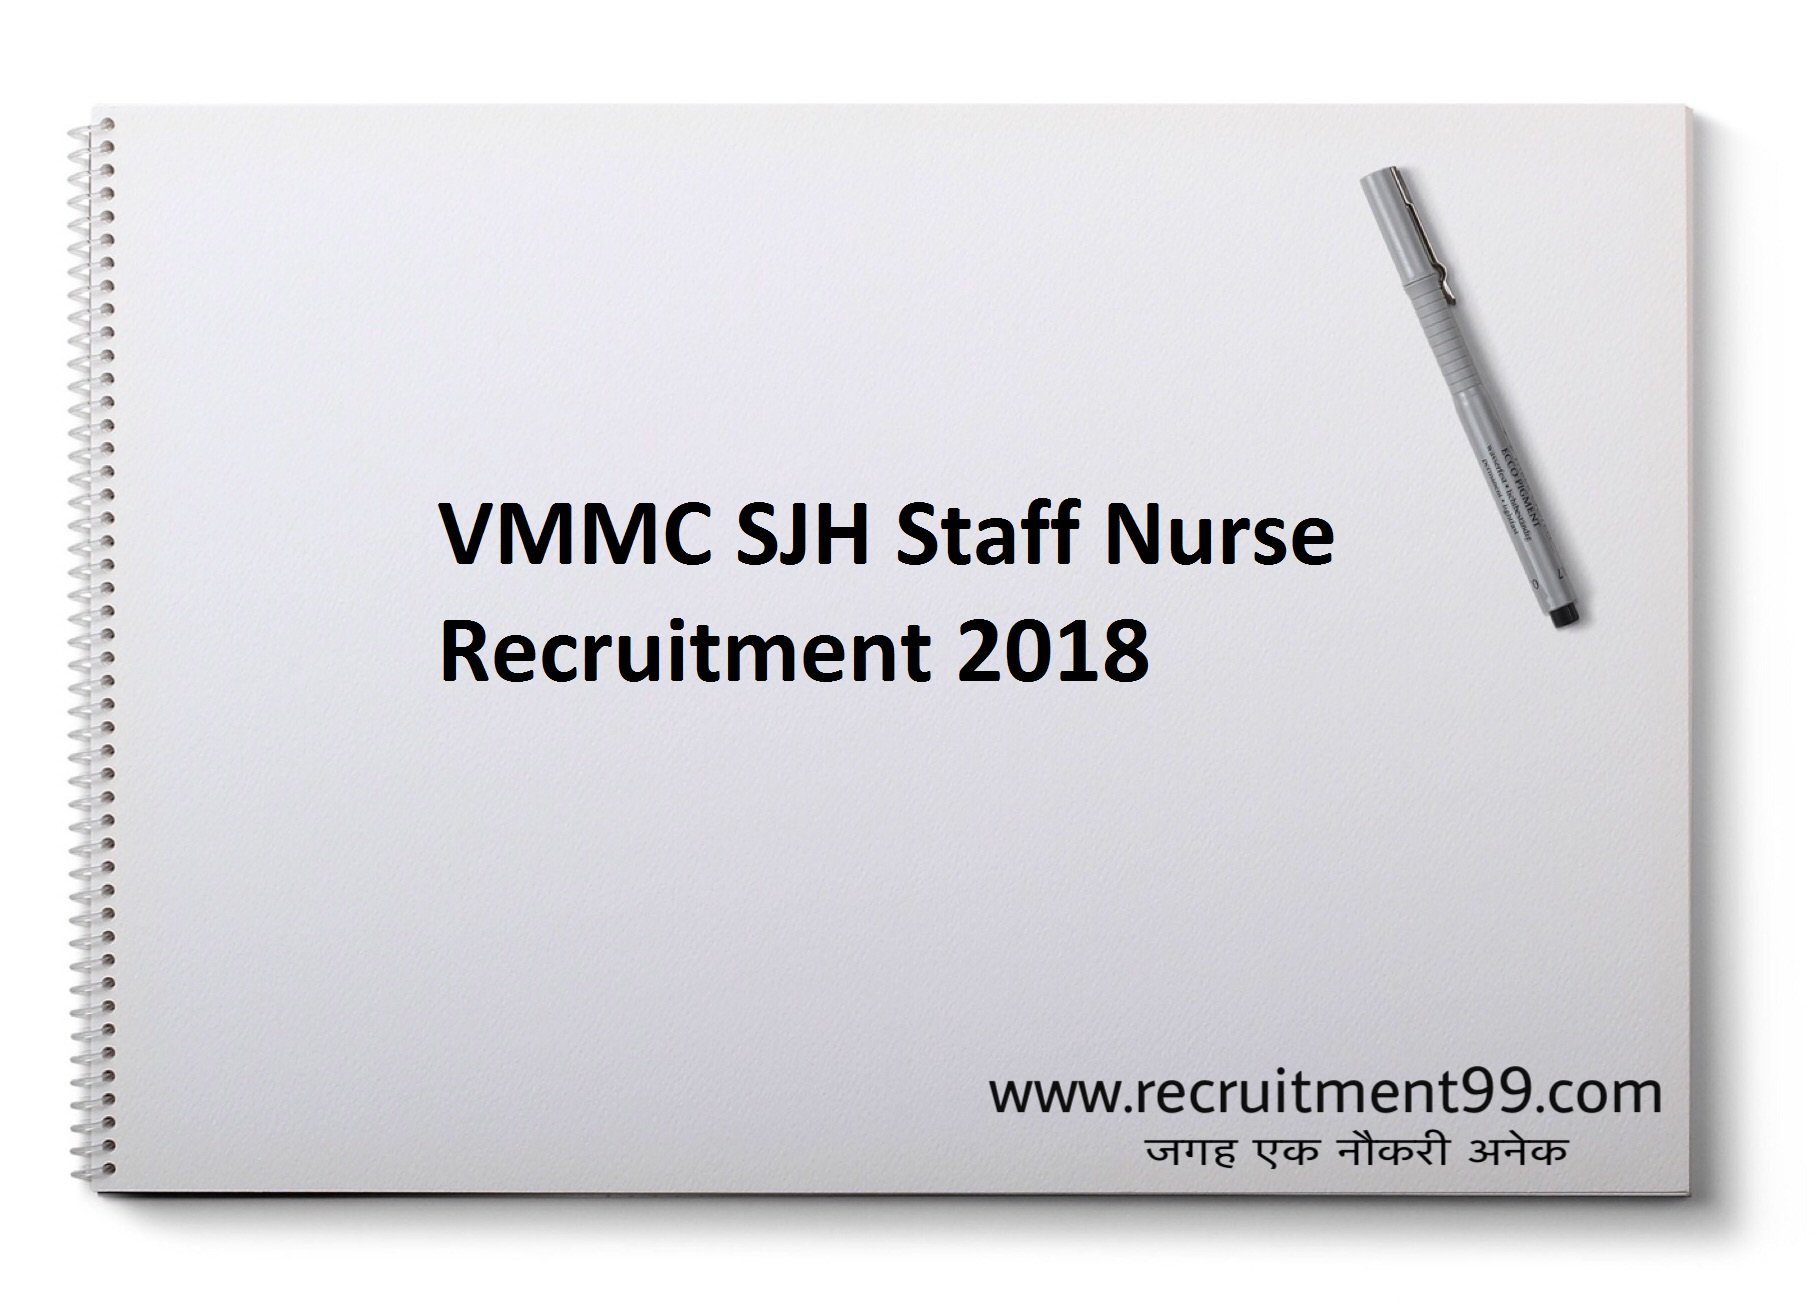 VMMC SJH Staff Nurse Recruitment Admit Card Result 2018